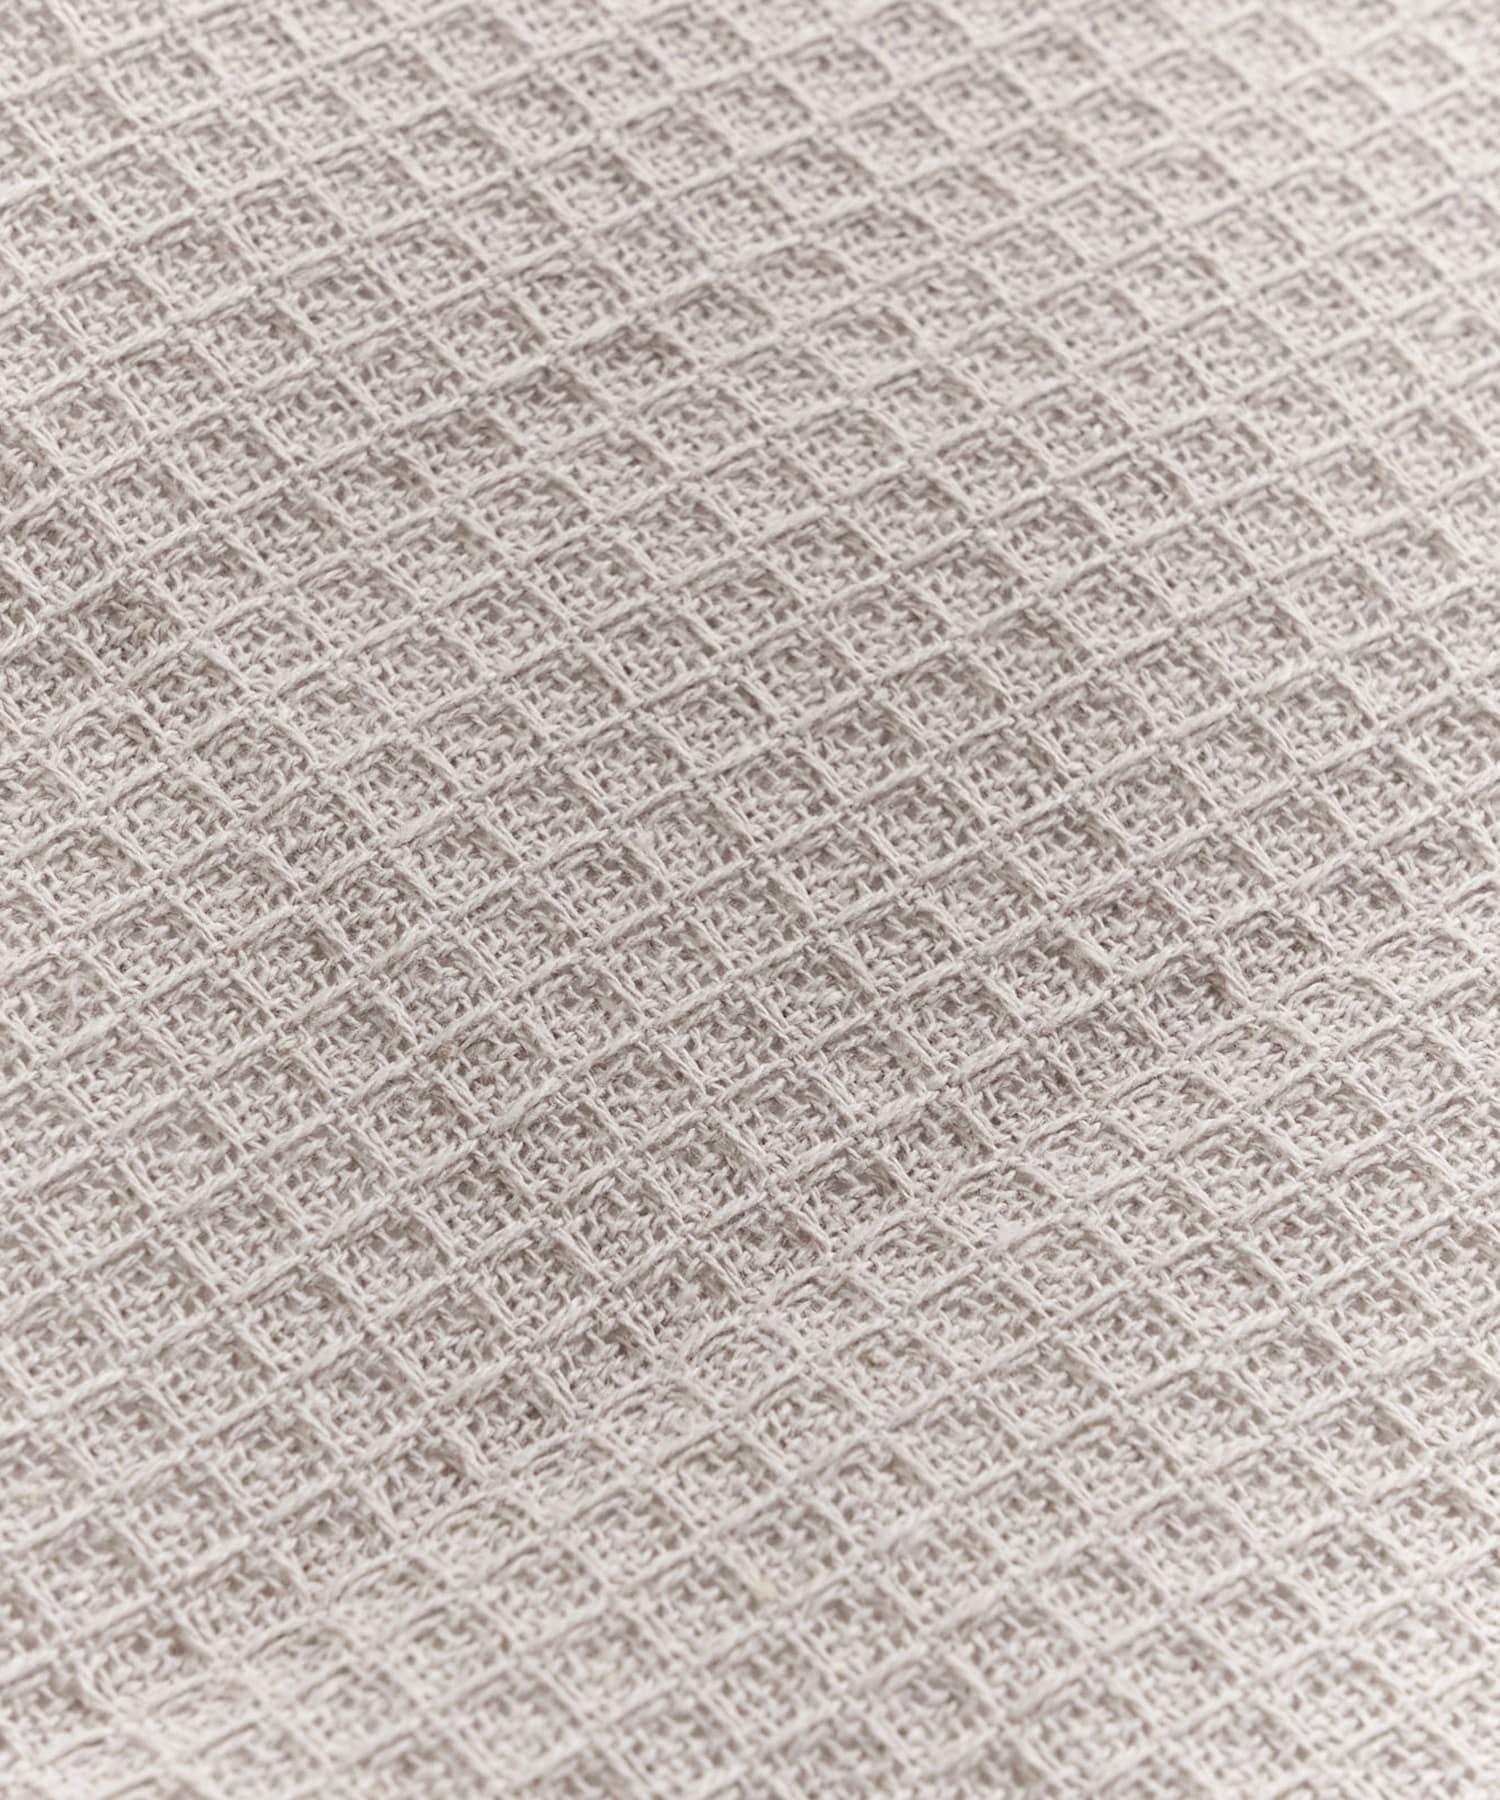 3COINS(スリーコインズ) 【ニュアンスカラー】ネーム付キッチンクロス6枚セット